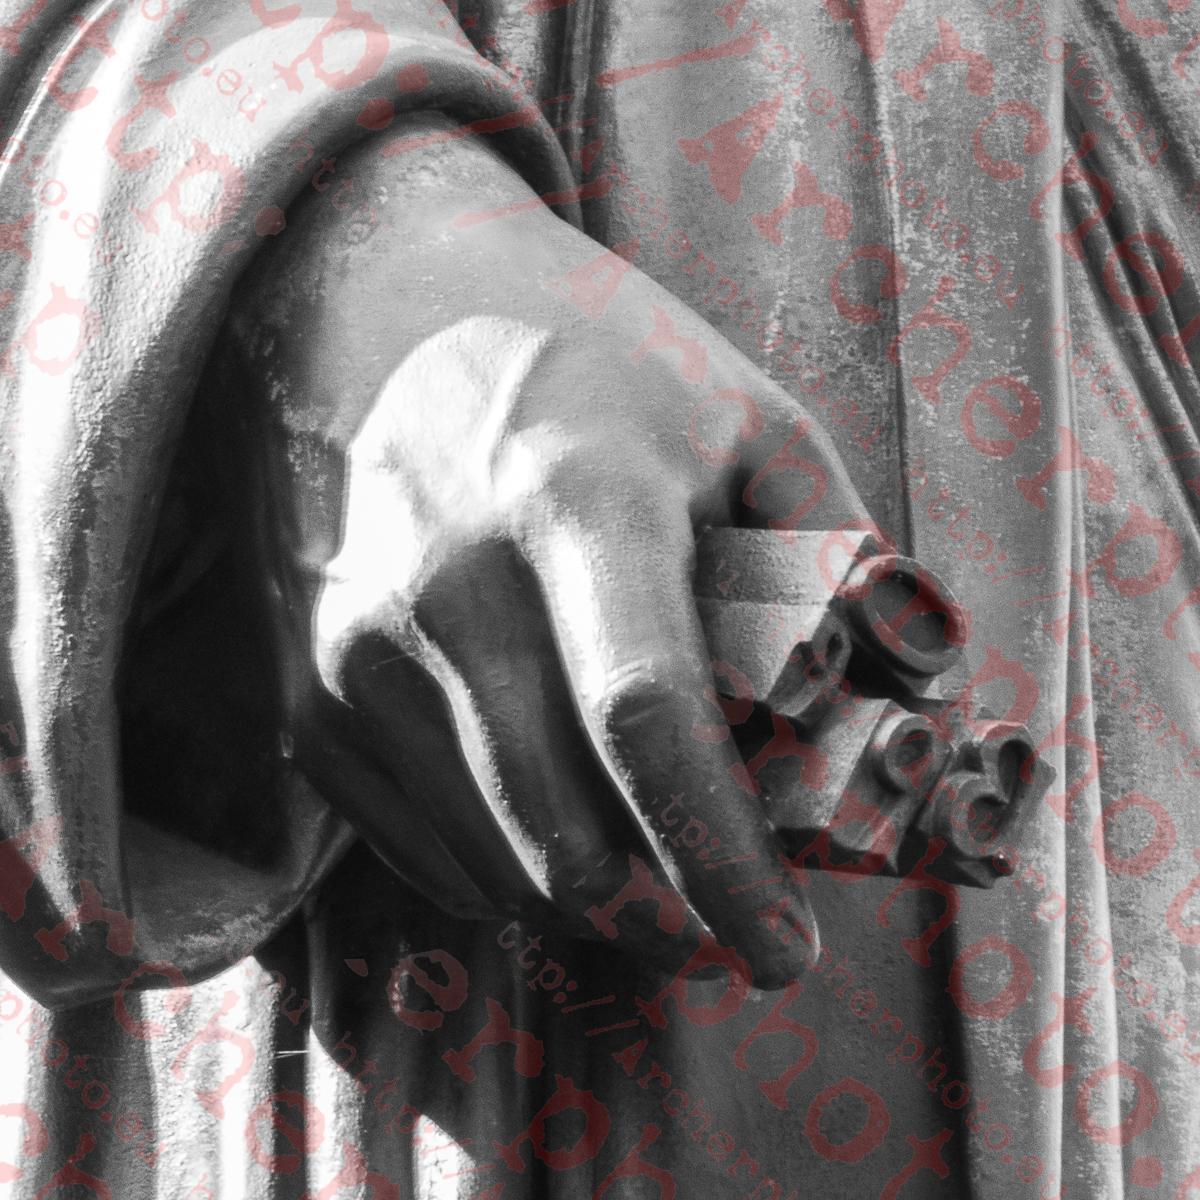 Mano de la estatua de Gutenberg, por Archerphoto, fotgrafo Valencia